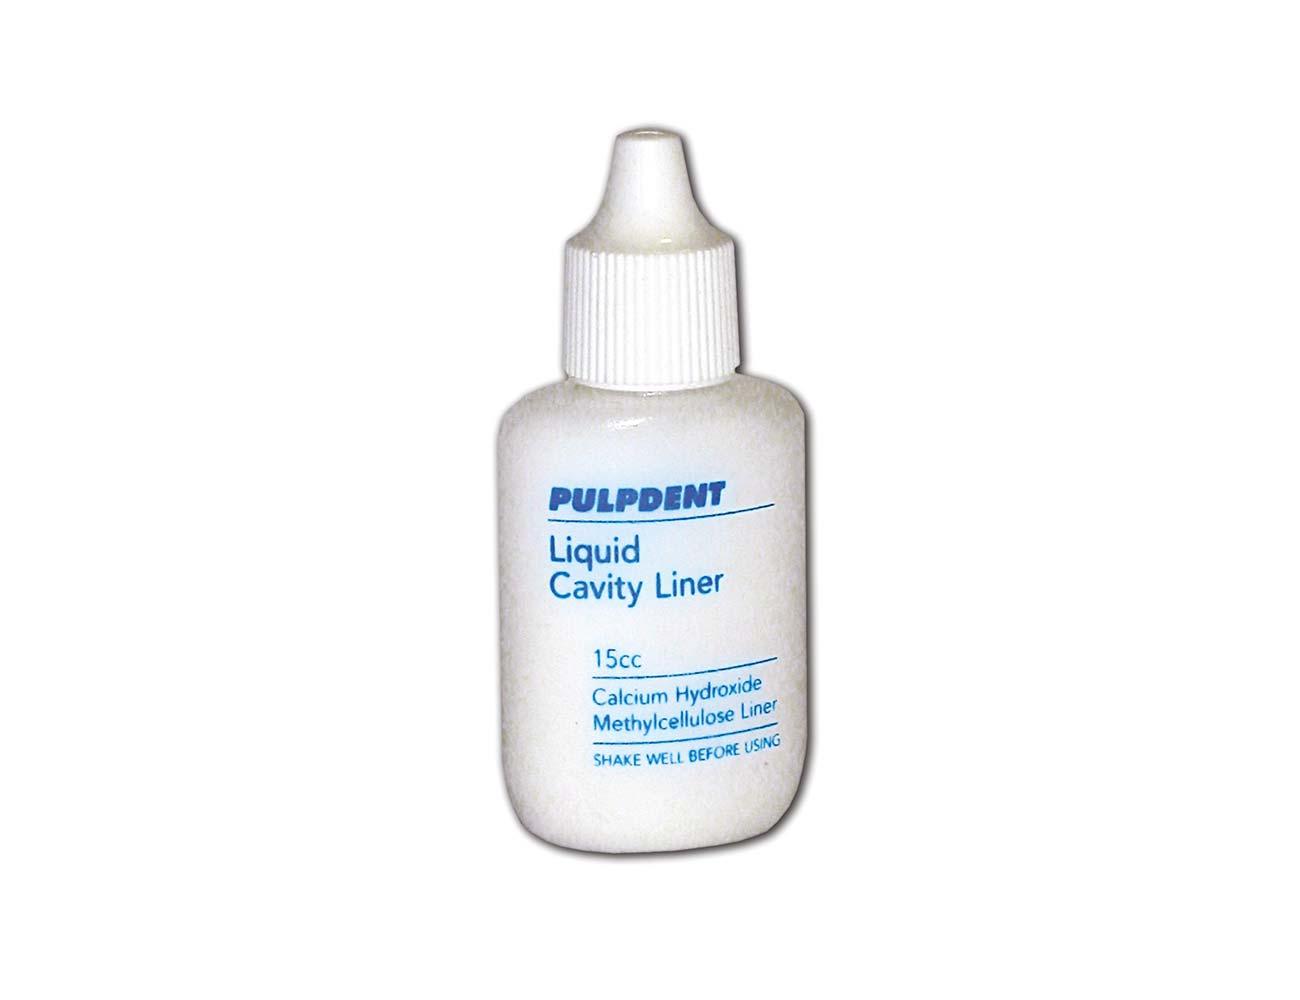 Pulpdent Cavity Liner